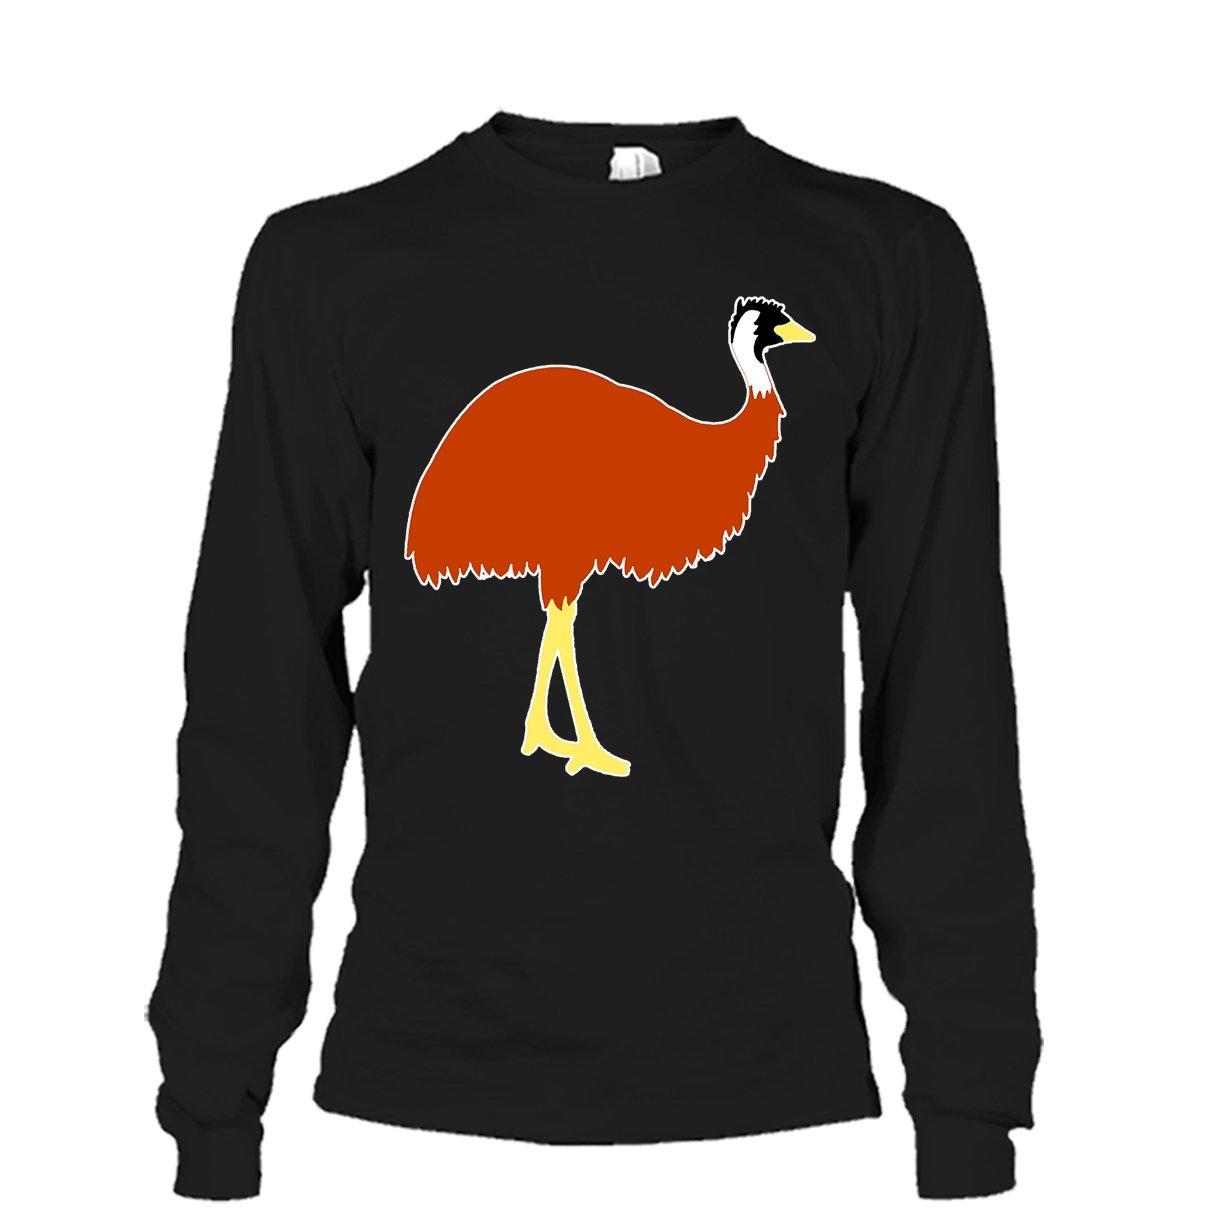 Emu Cool Tshirt Love Emu Emoji Tee Shirt Design for Men and Women